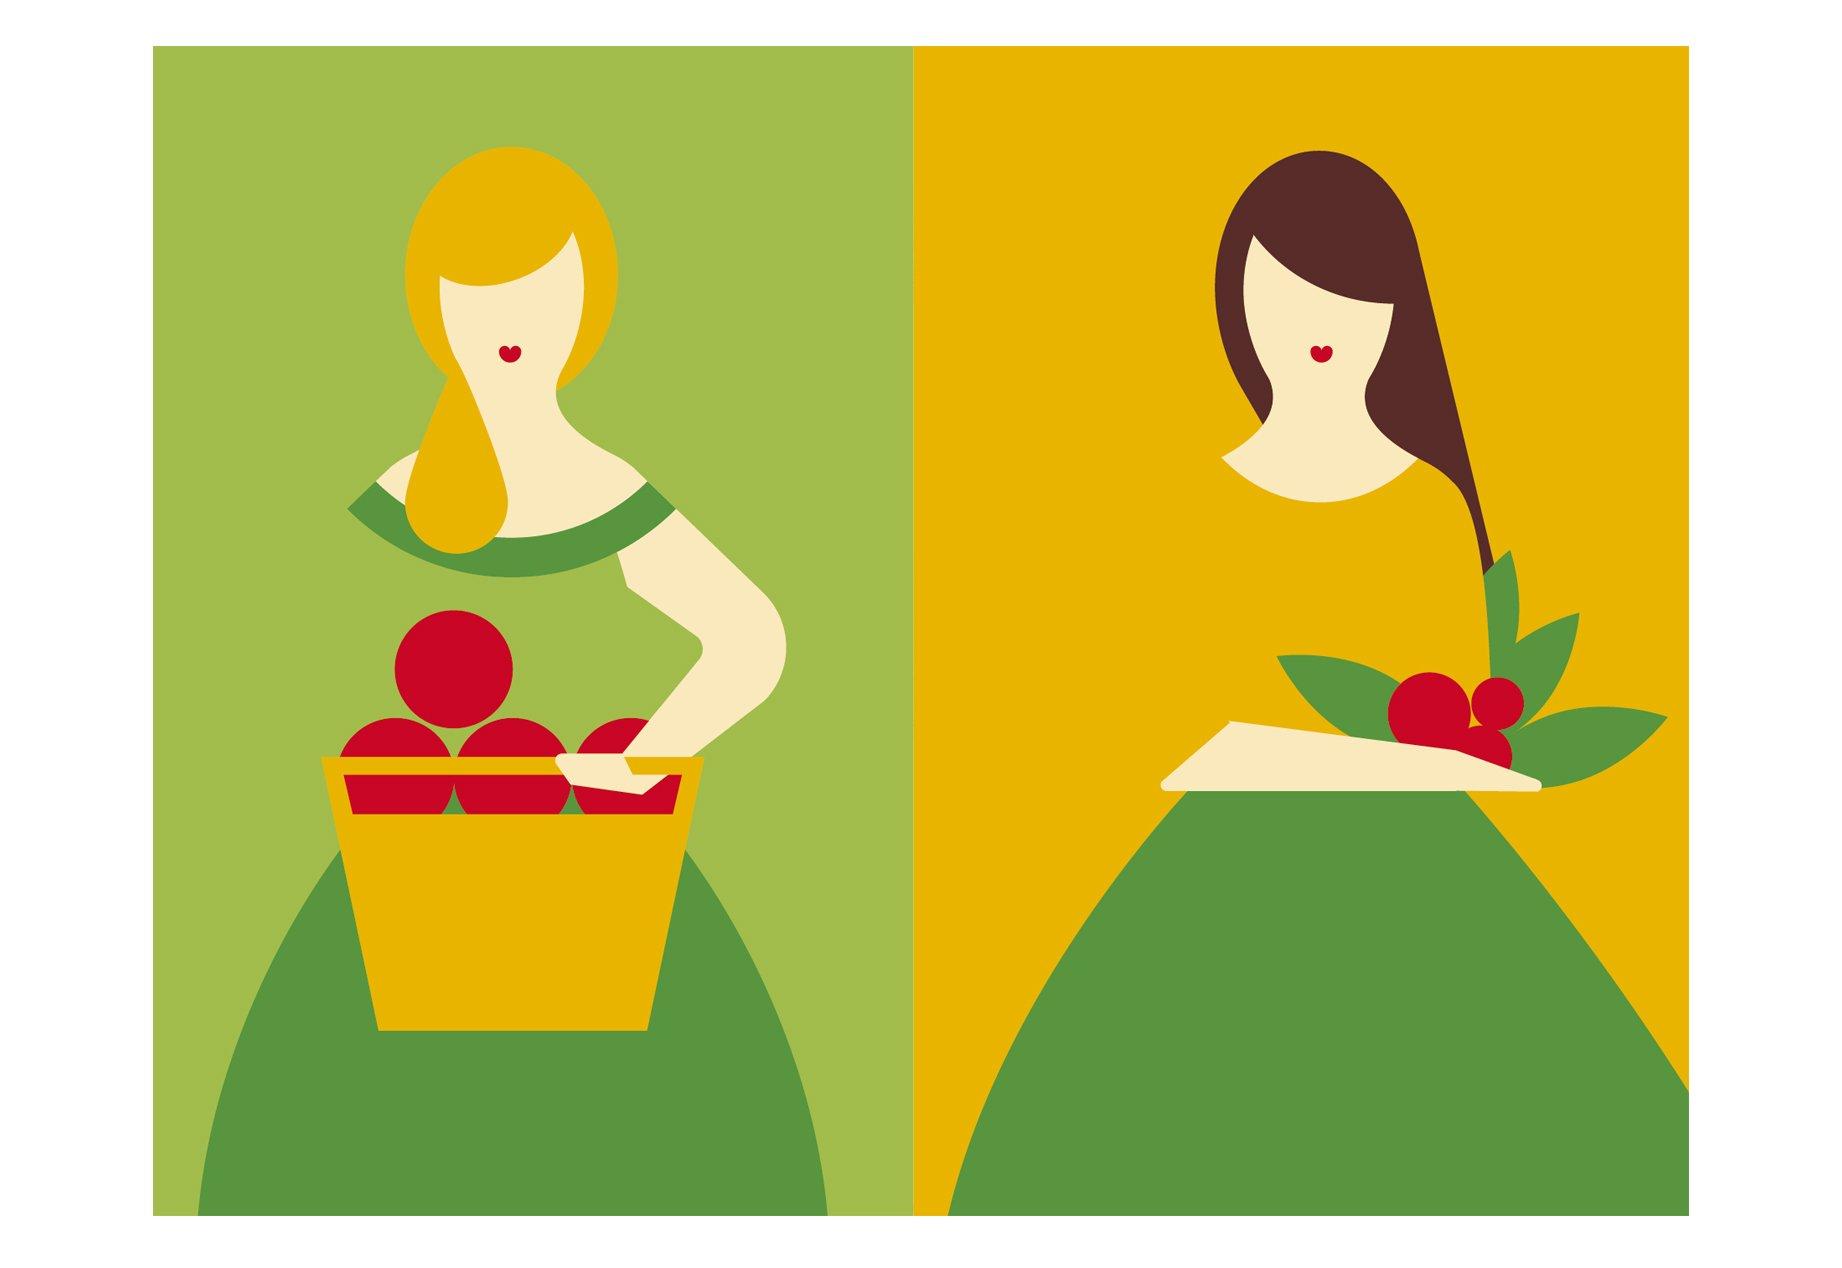 girls-illustration-02-alice-iuri